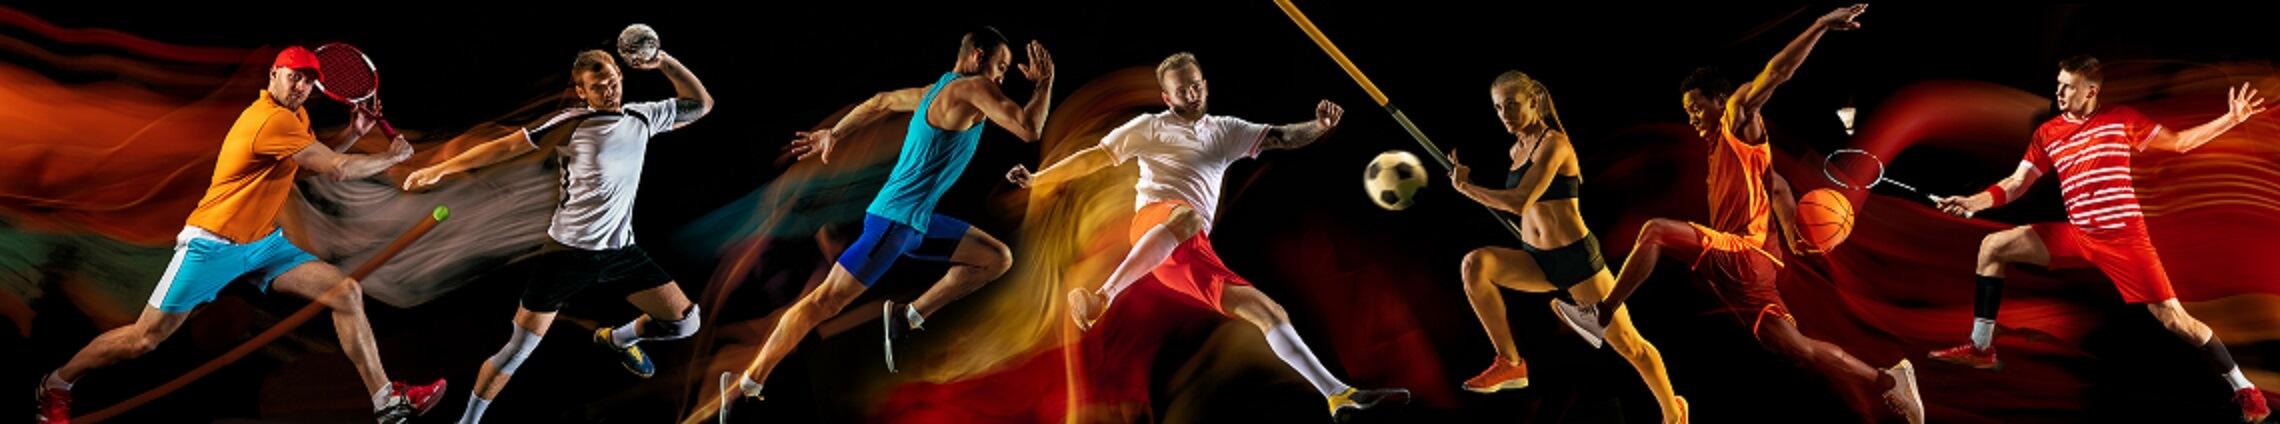 Sportler fotografiert: professionelle Sportfotografie